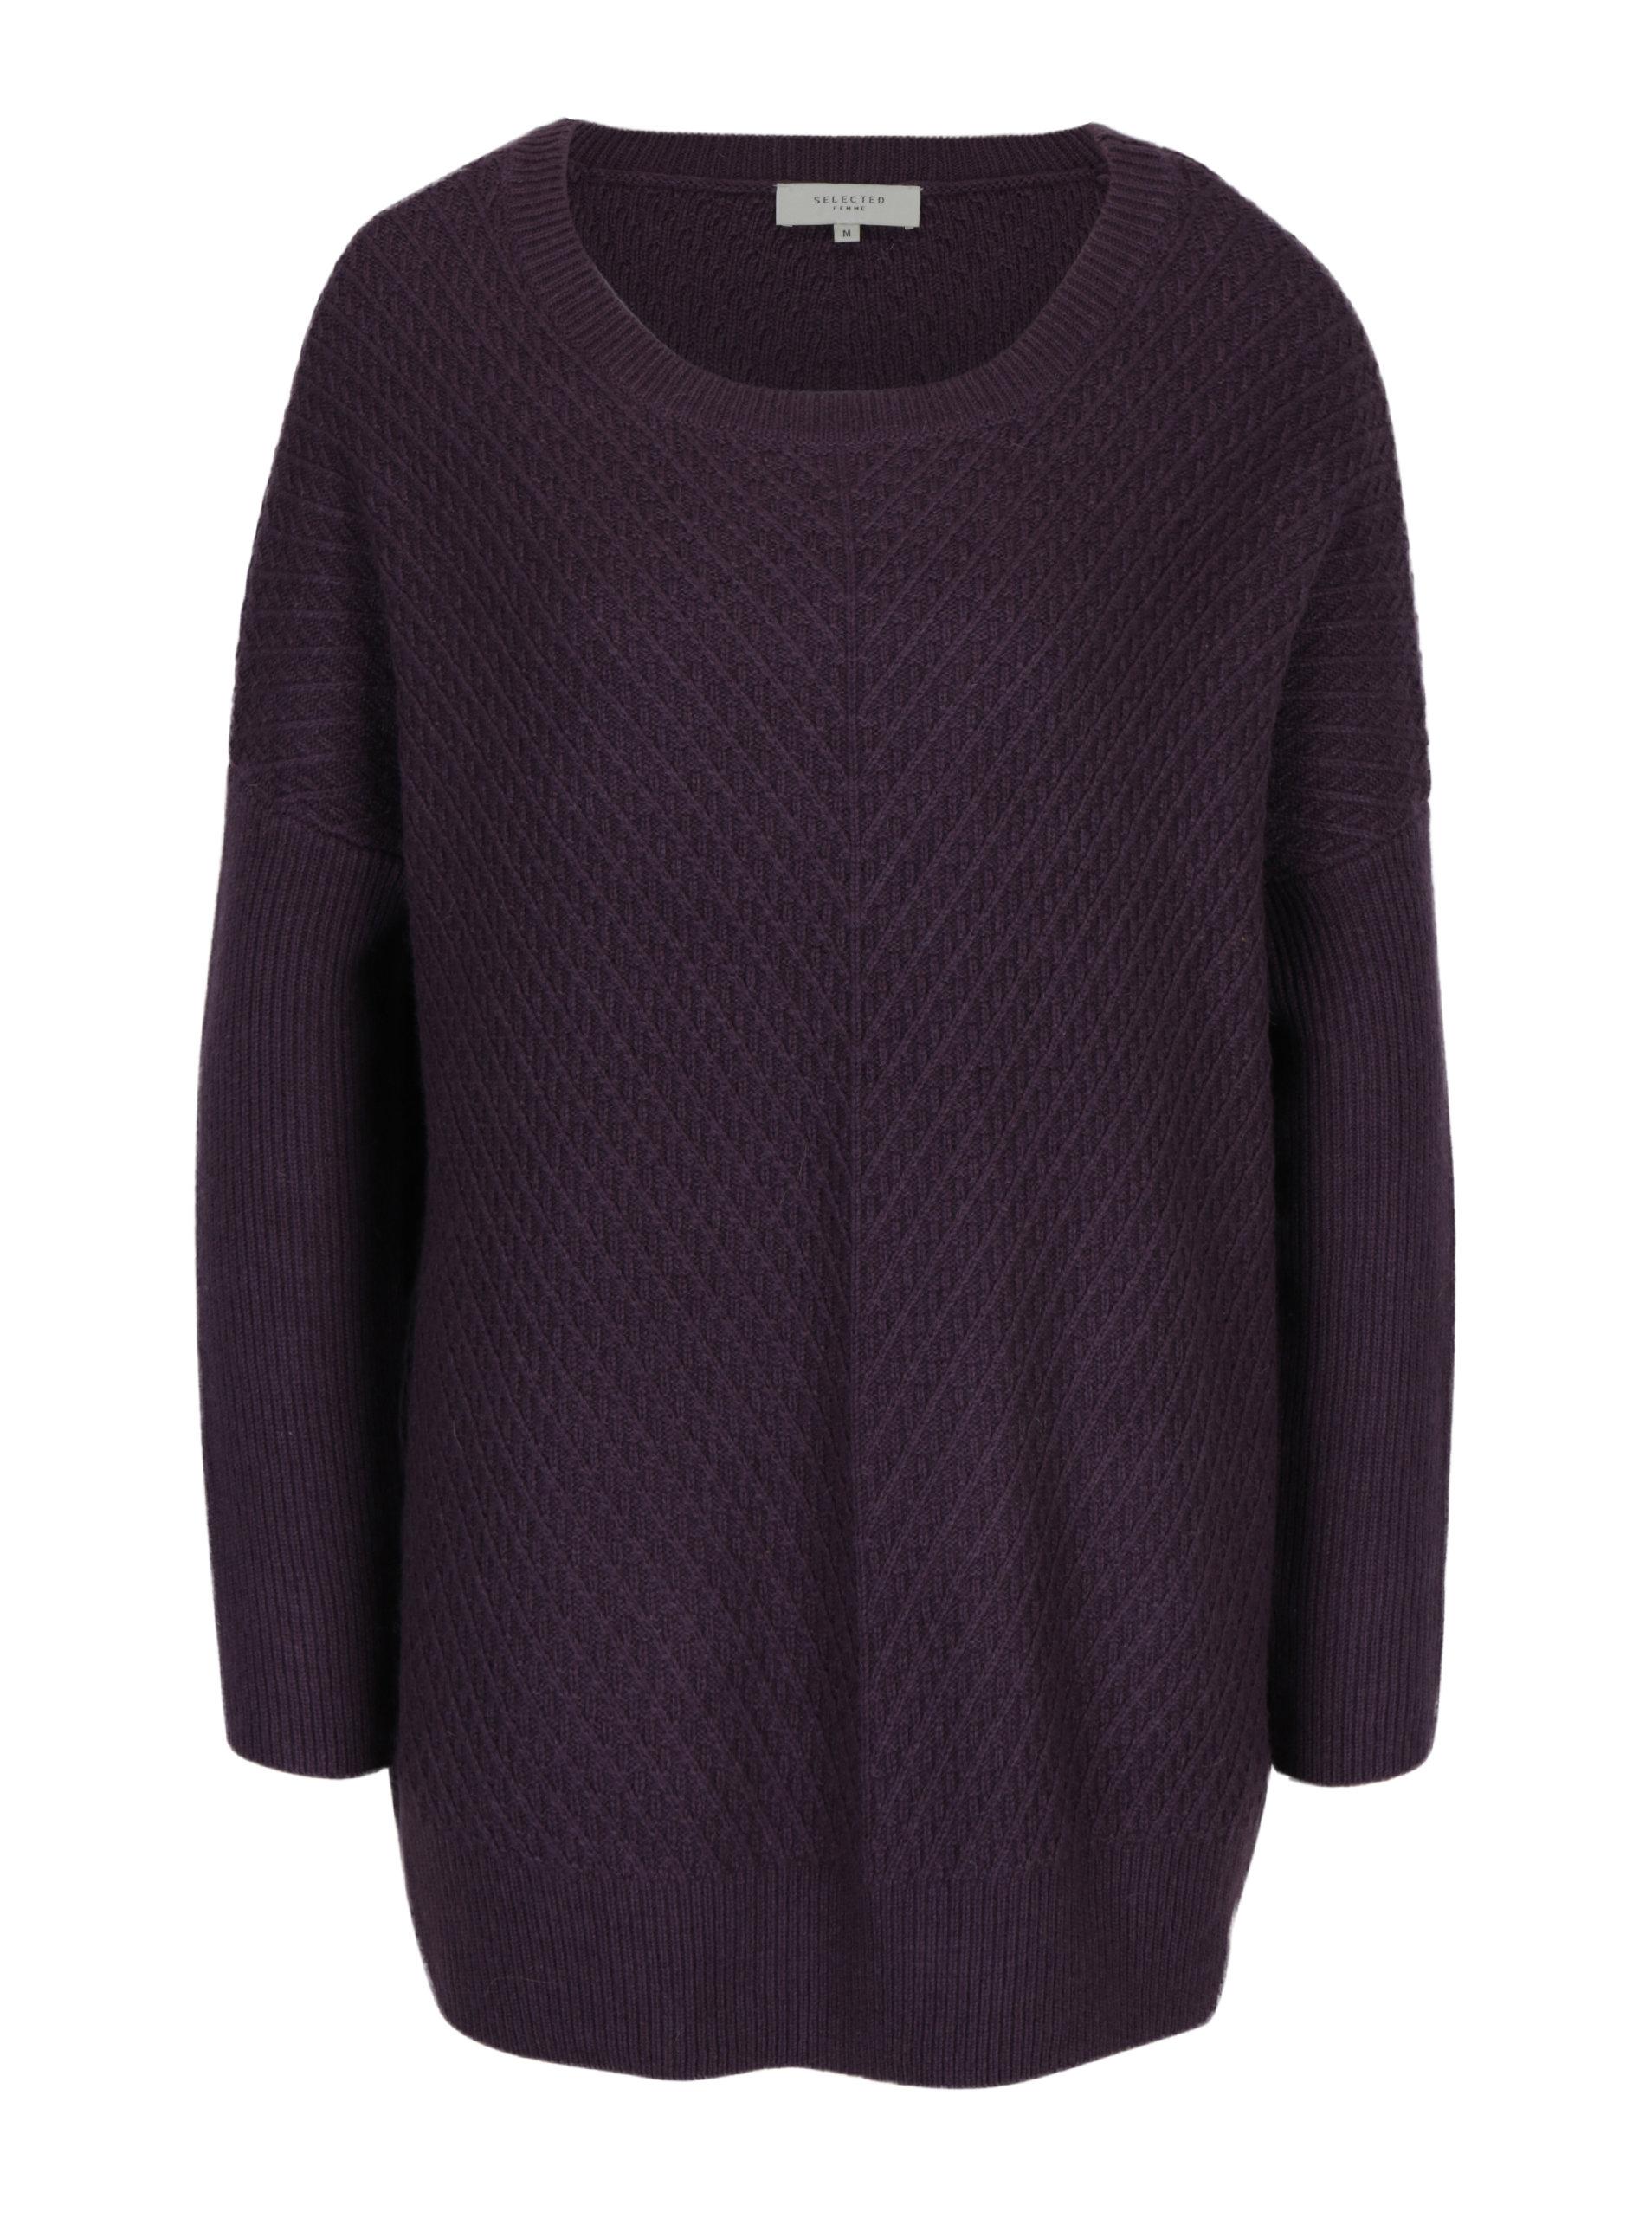 ef2bab15d2d6 Fialový dlhý vlnený sveter Selected Femme Rille ...